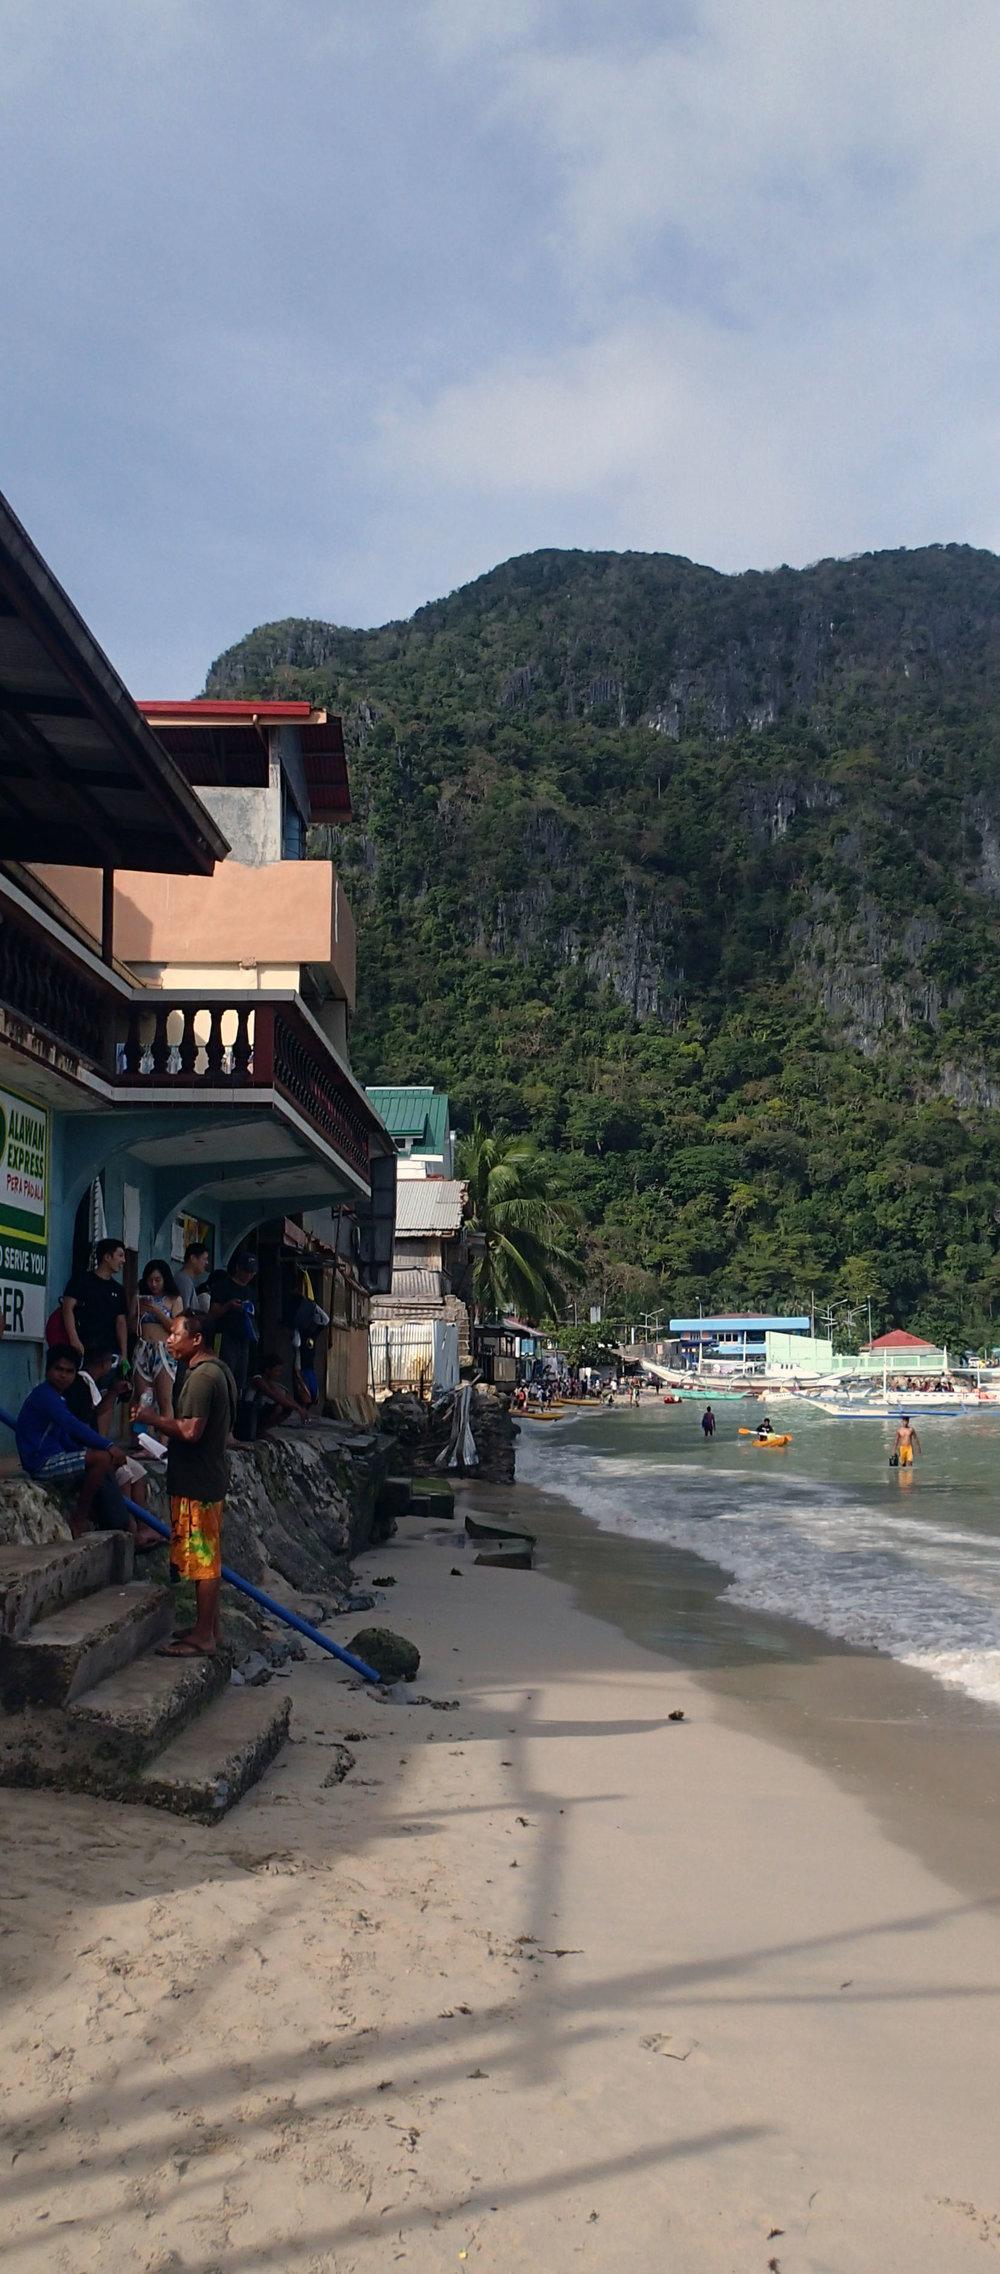 El Nido beach 1-23-17.jpg